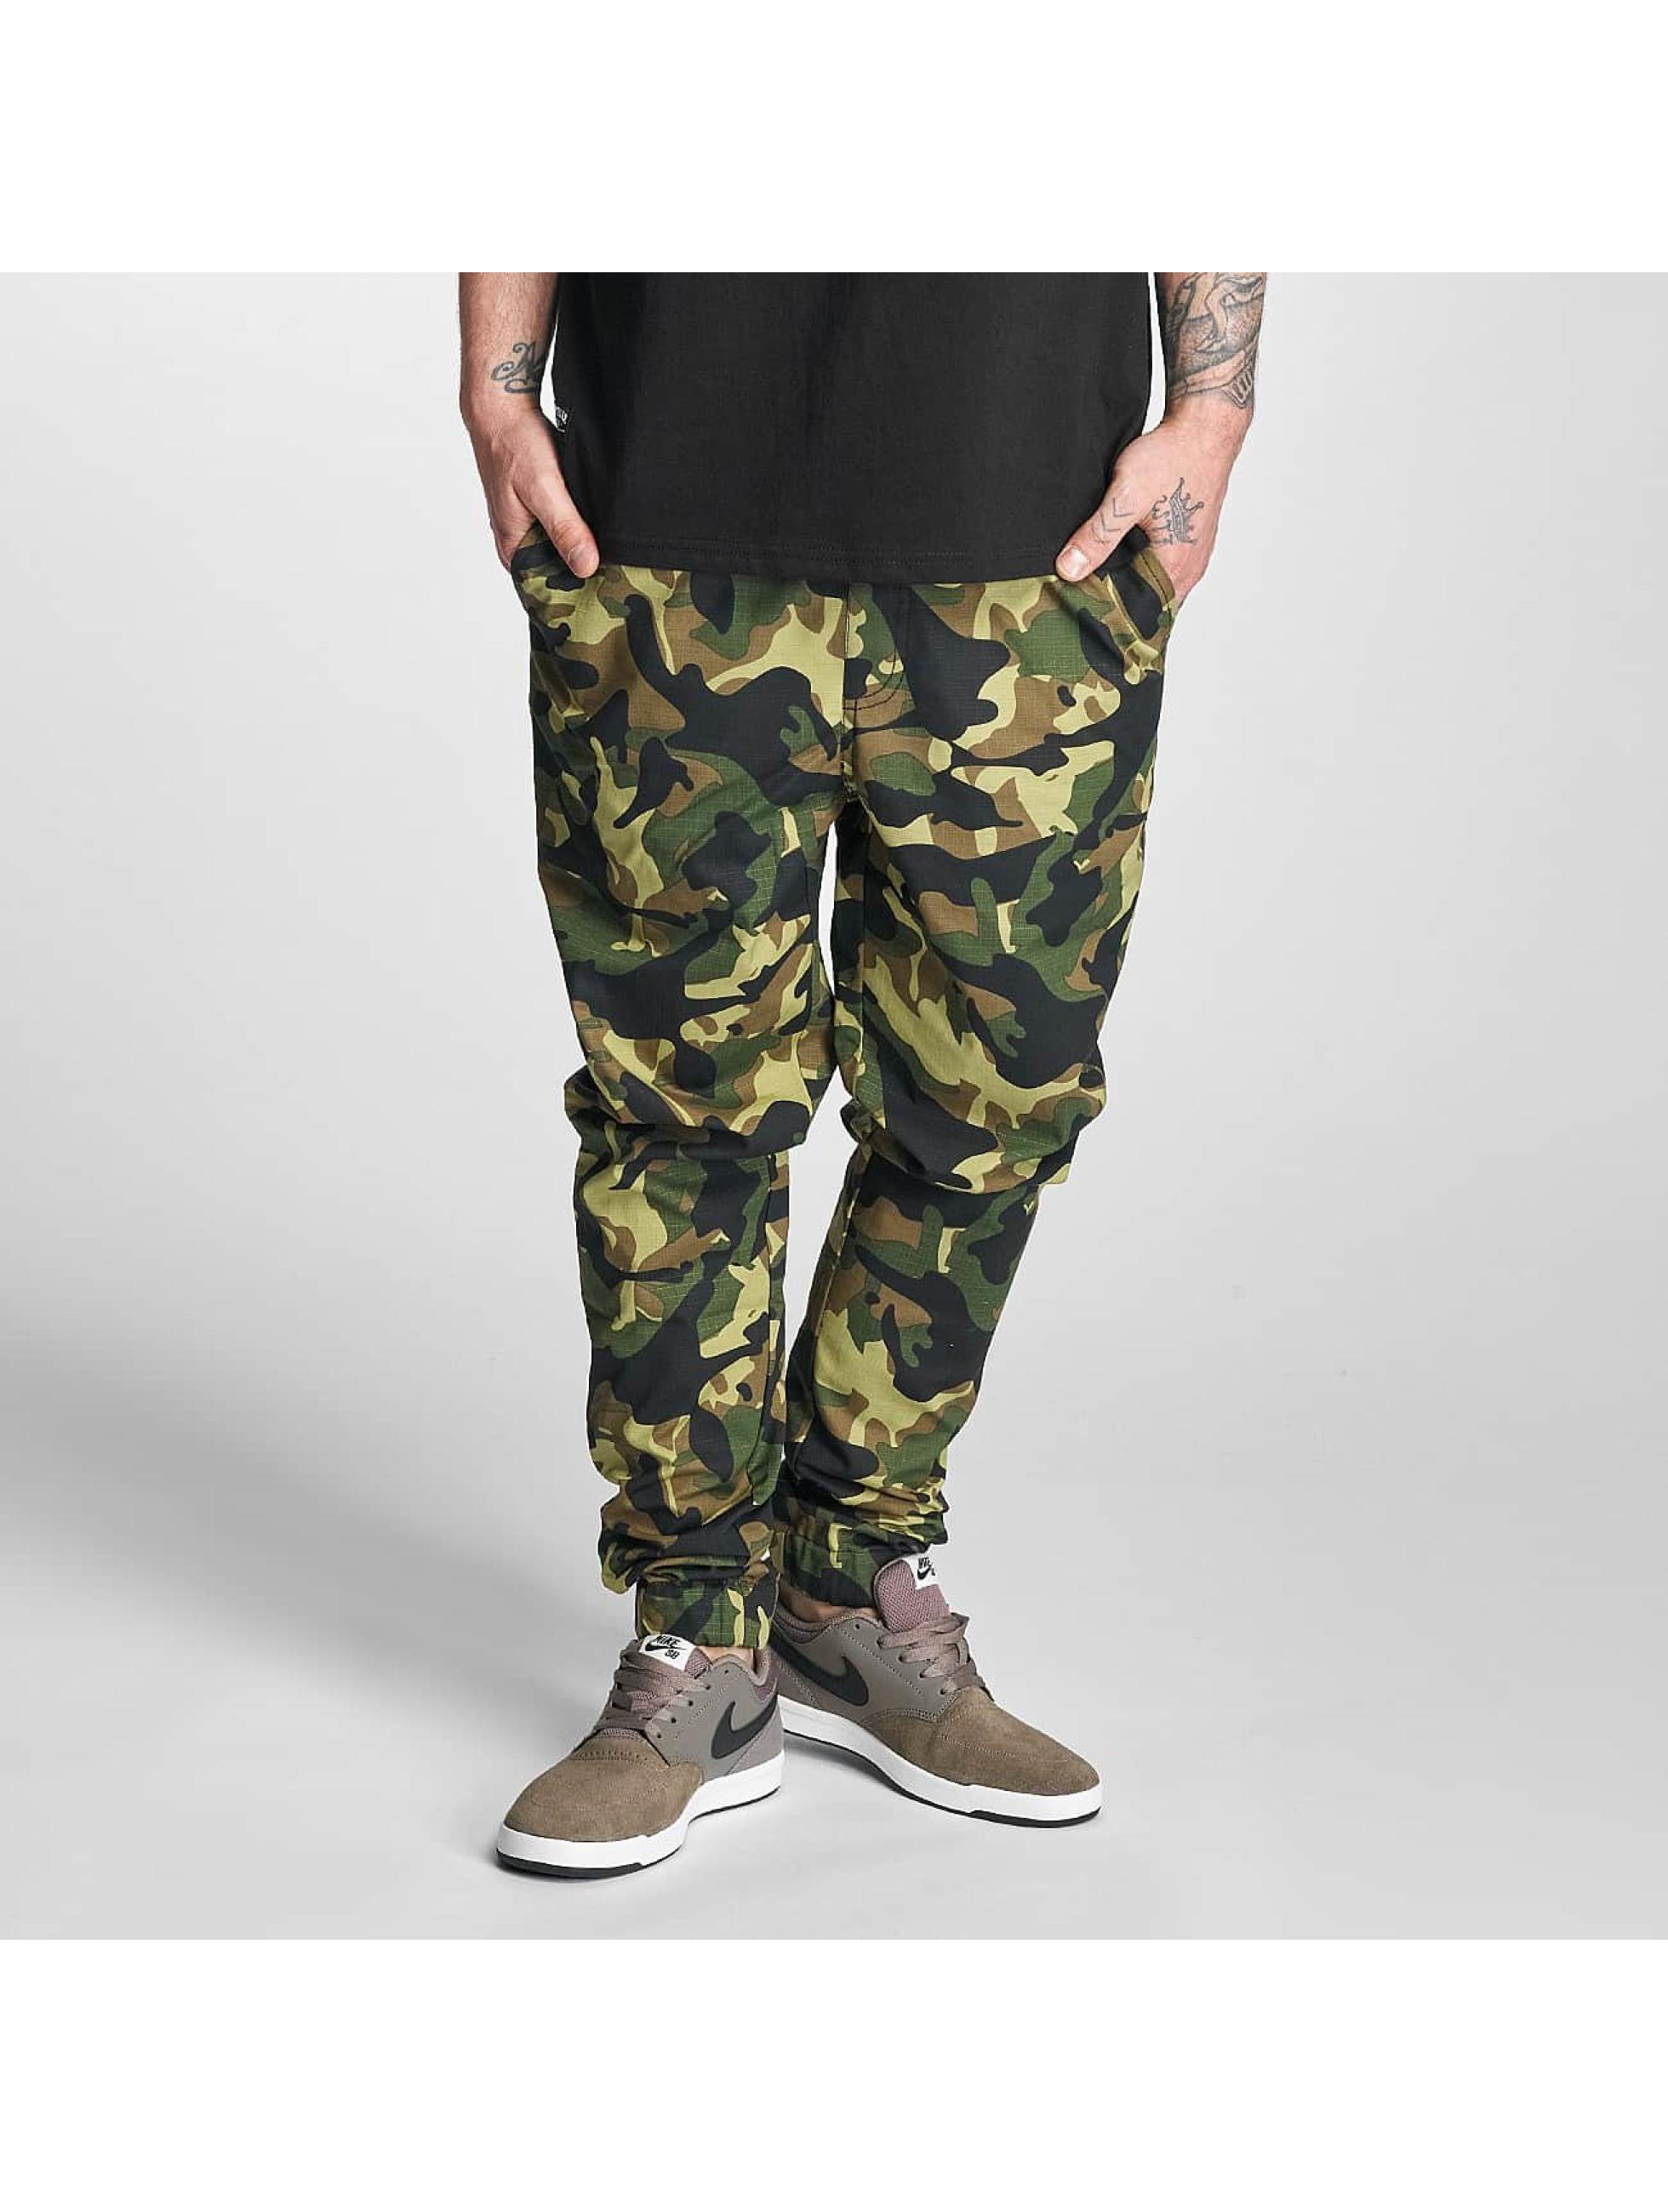 Pelle Pelle Männer Jogginghose Ribstop in camouflage